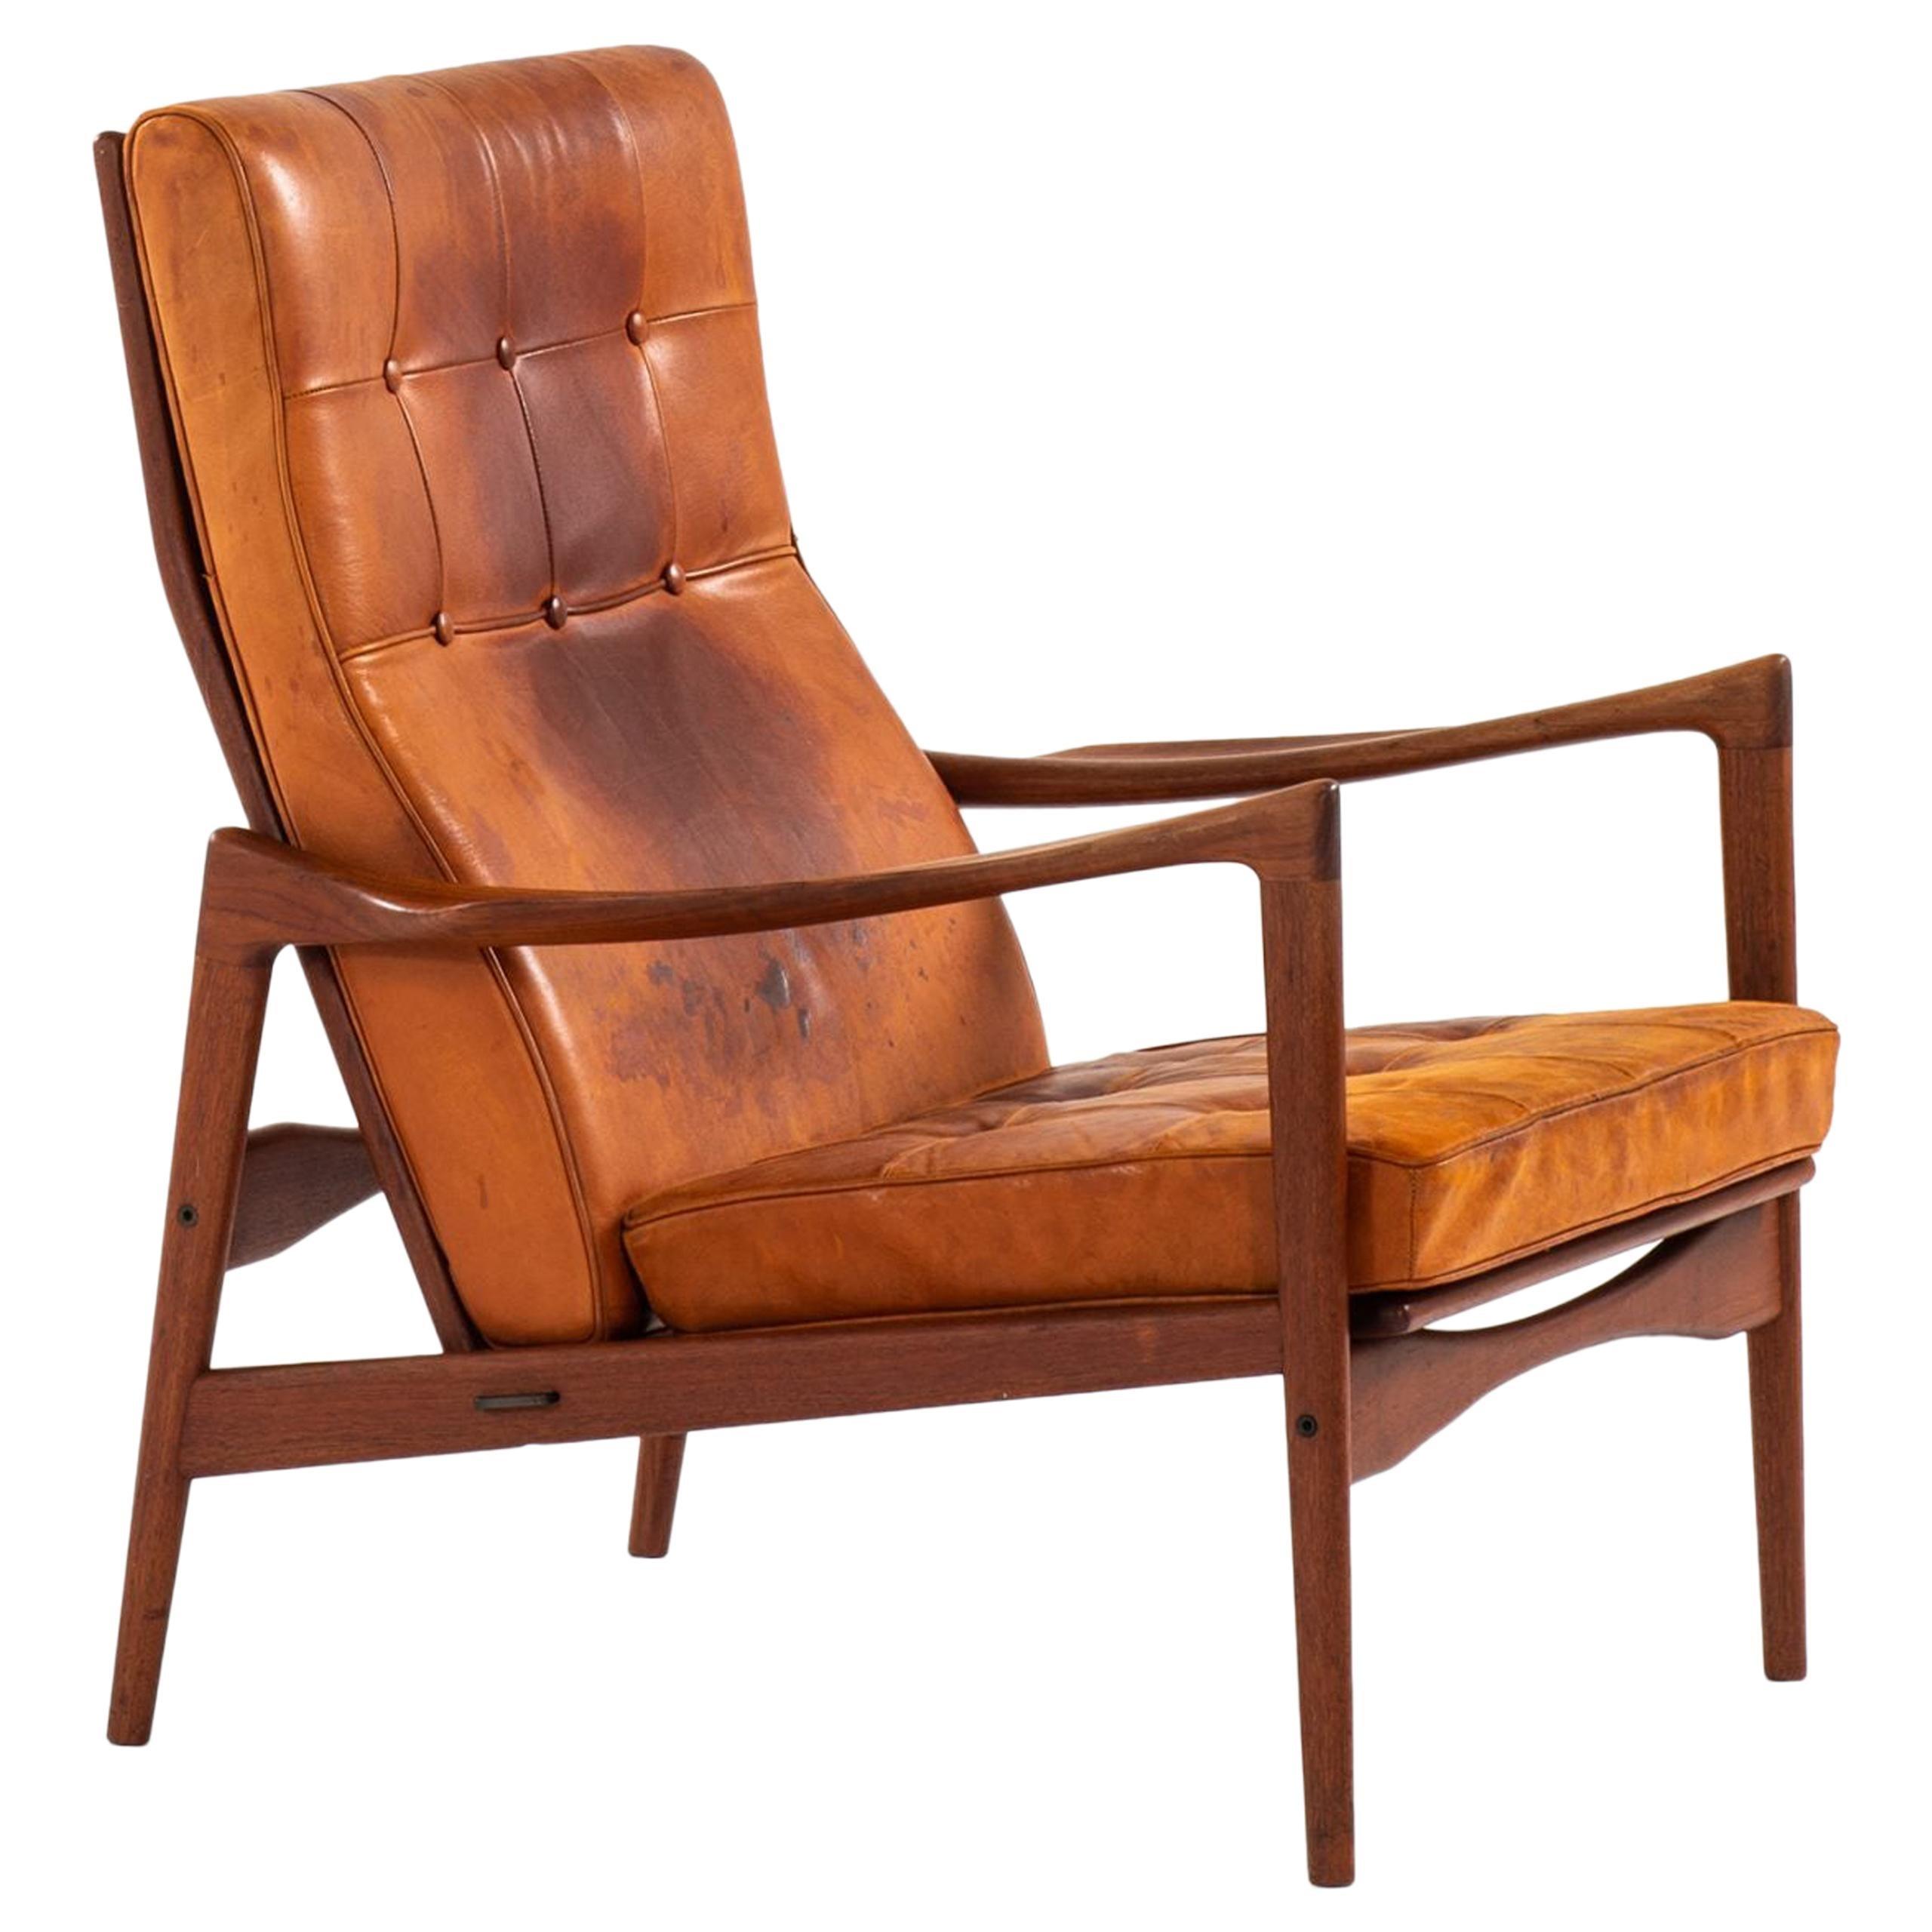 Ib Kofod-Larsen Easy Chair Model Örenäs Produced by OPE in Sweden